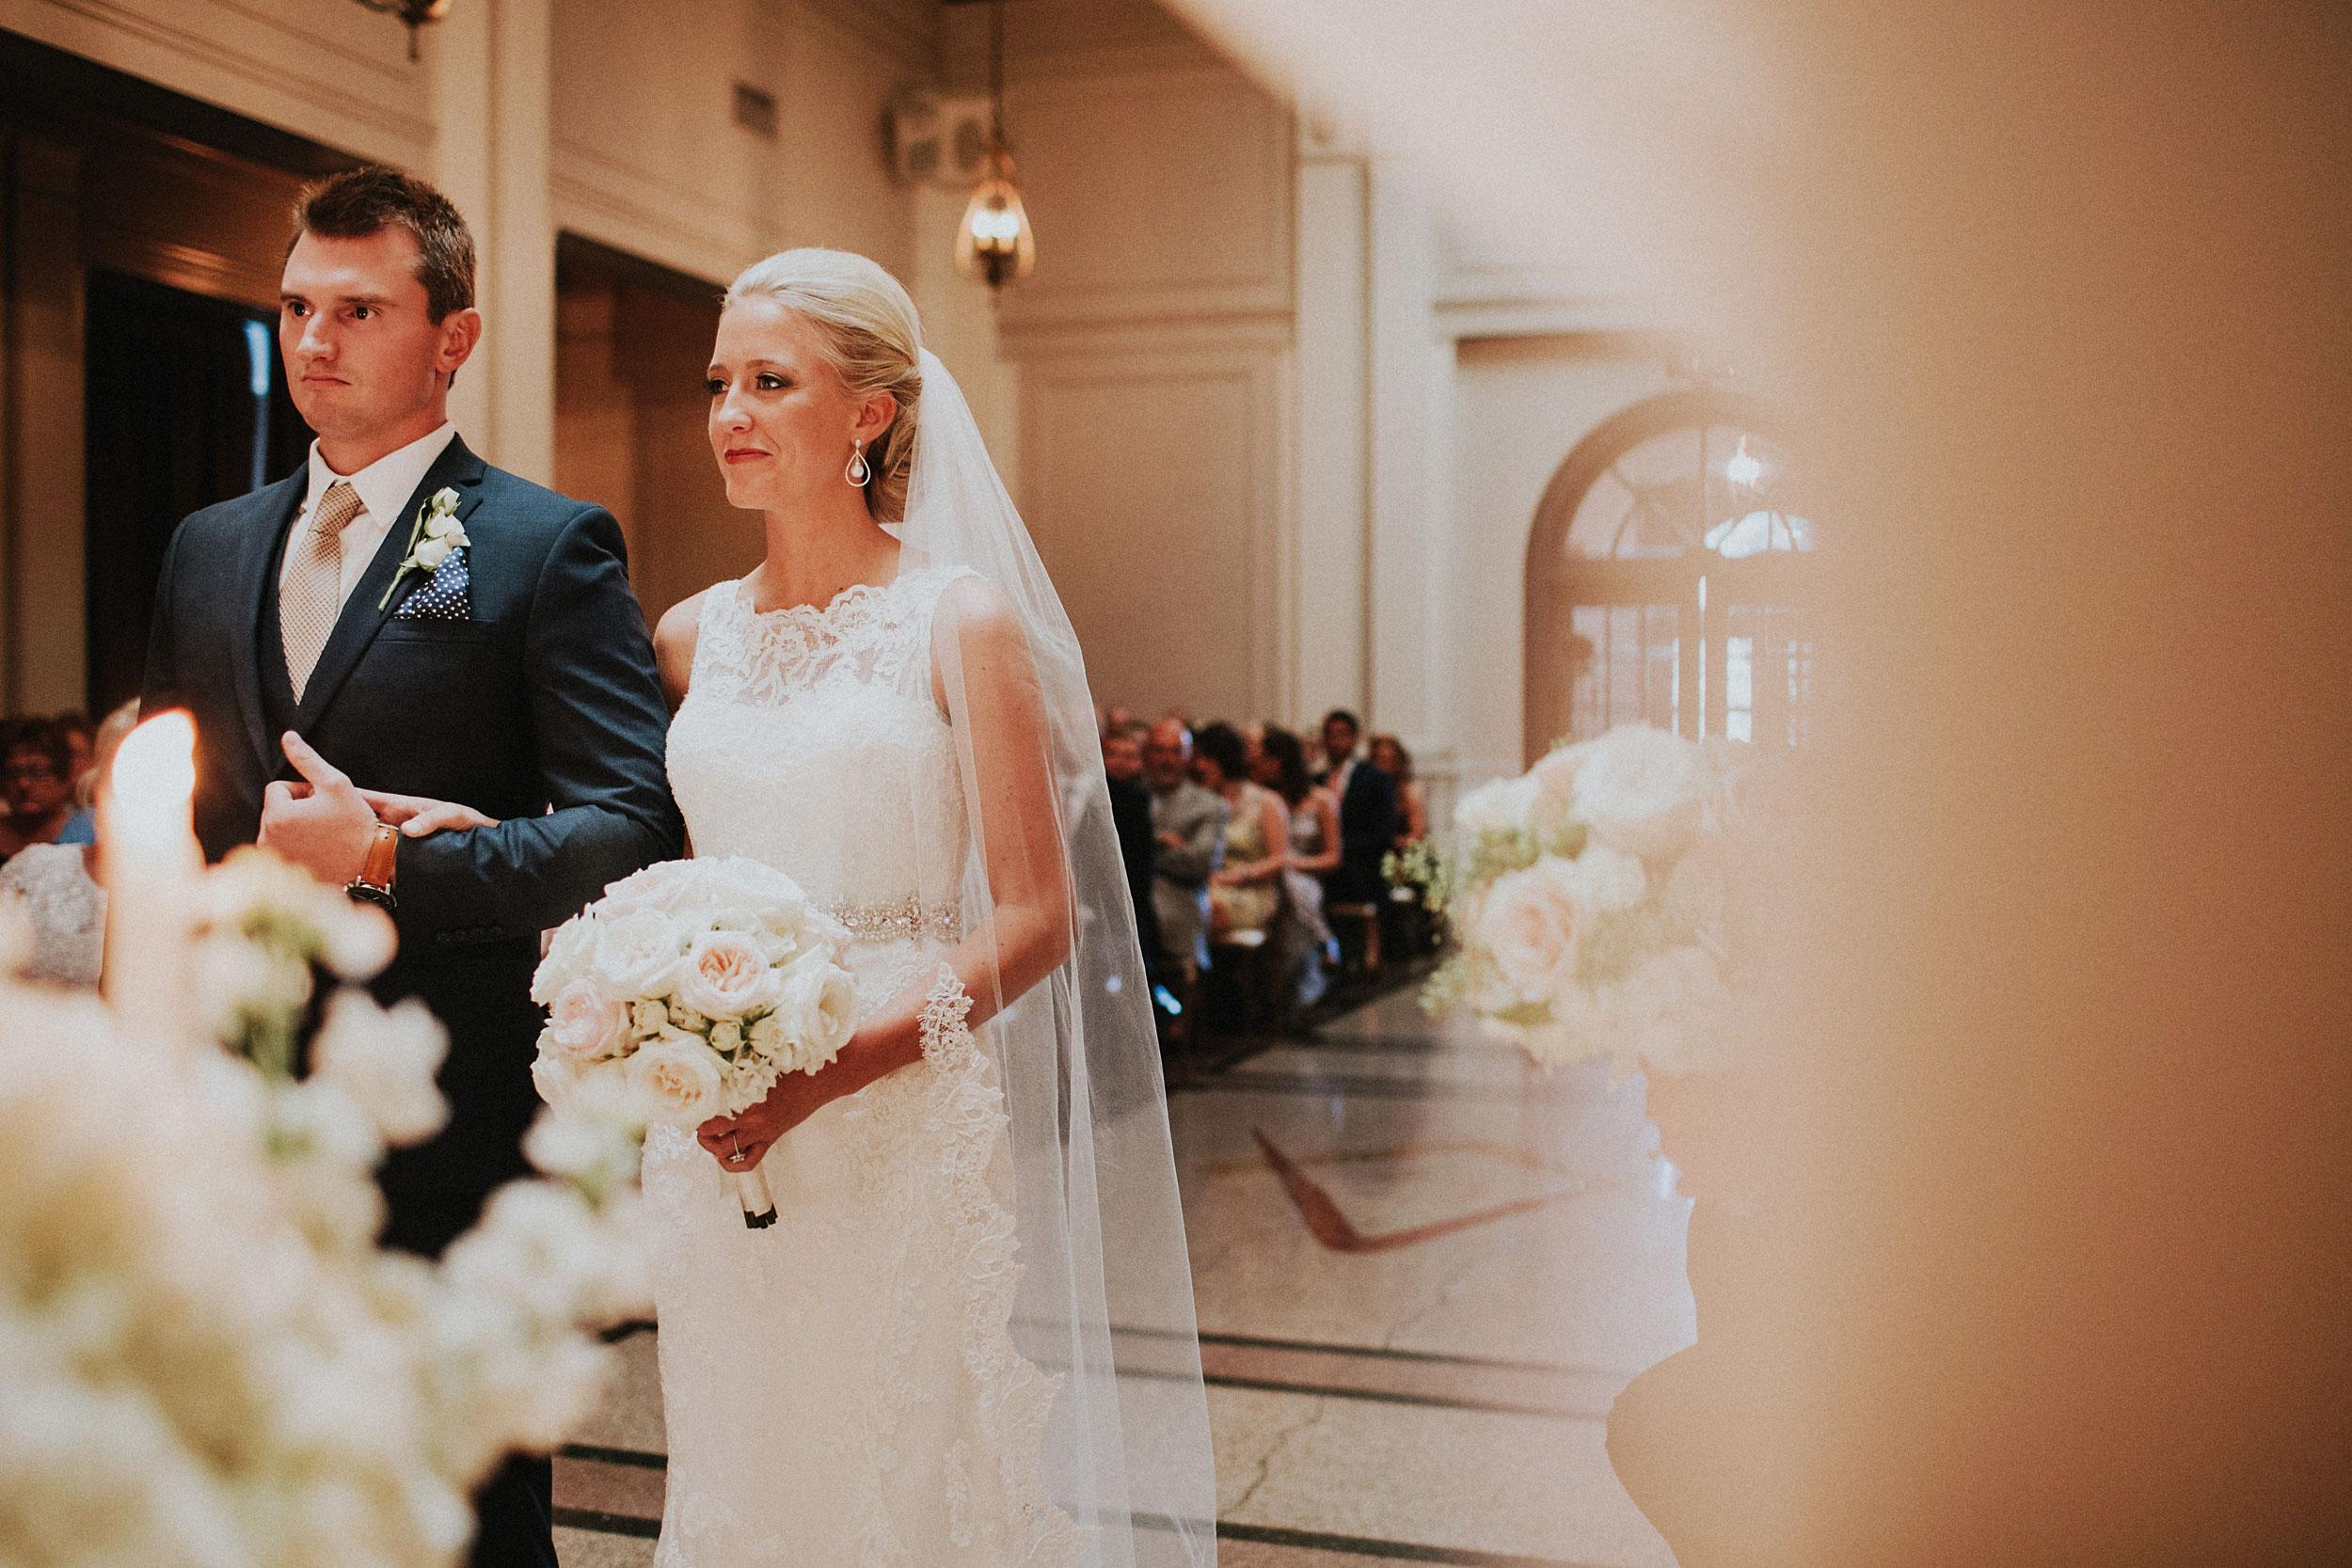 olmsted-wedding-louisville-kentucky-026.JPG